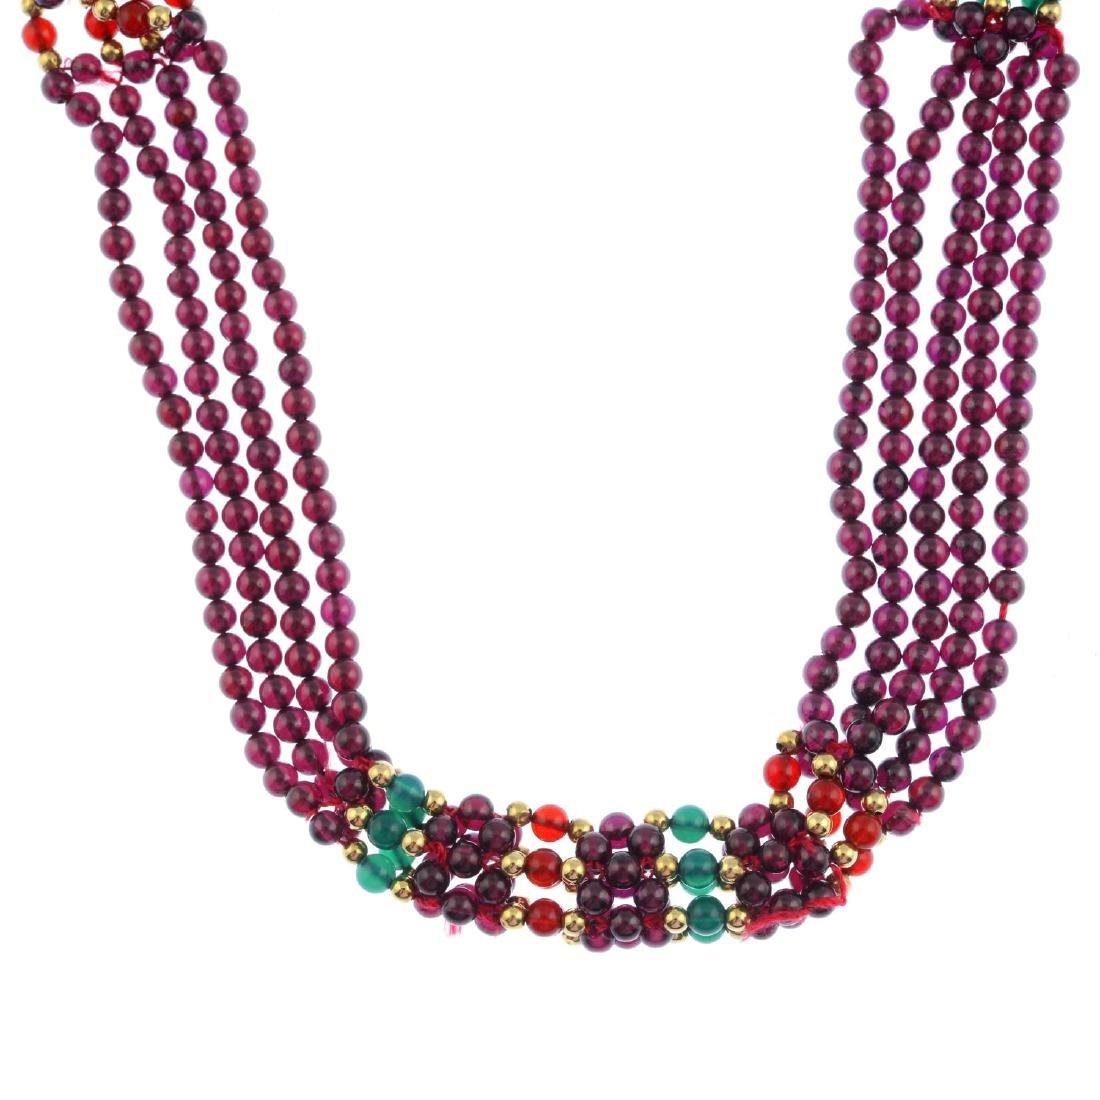 A garnet bead necklace. Comprising five strands of